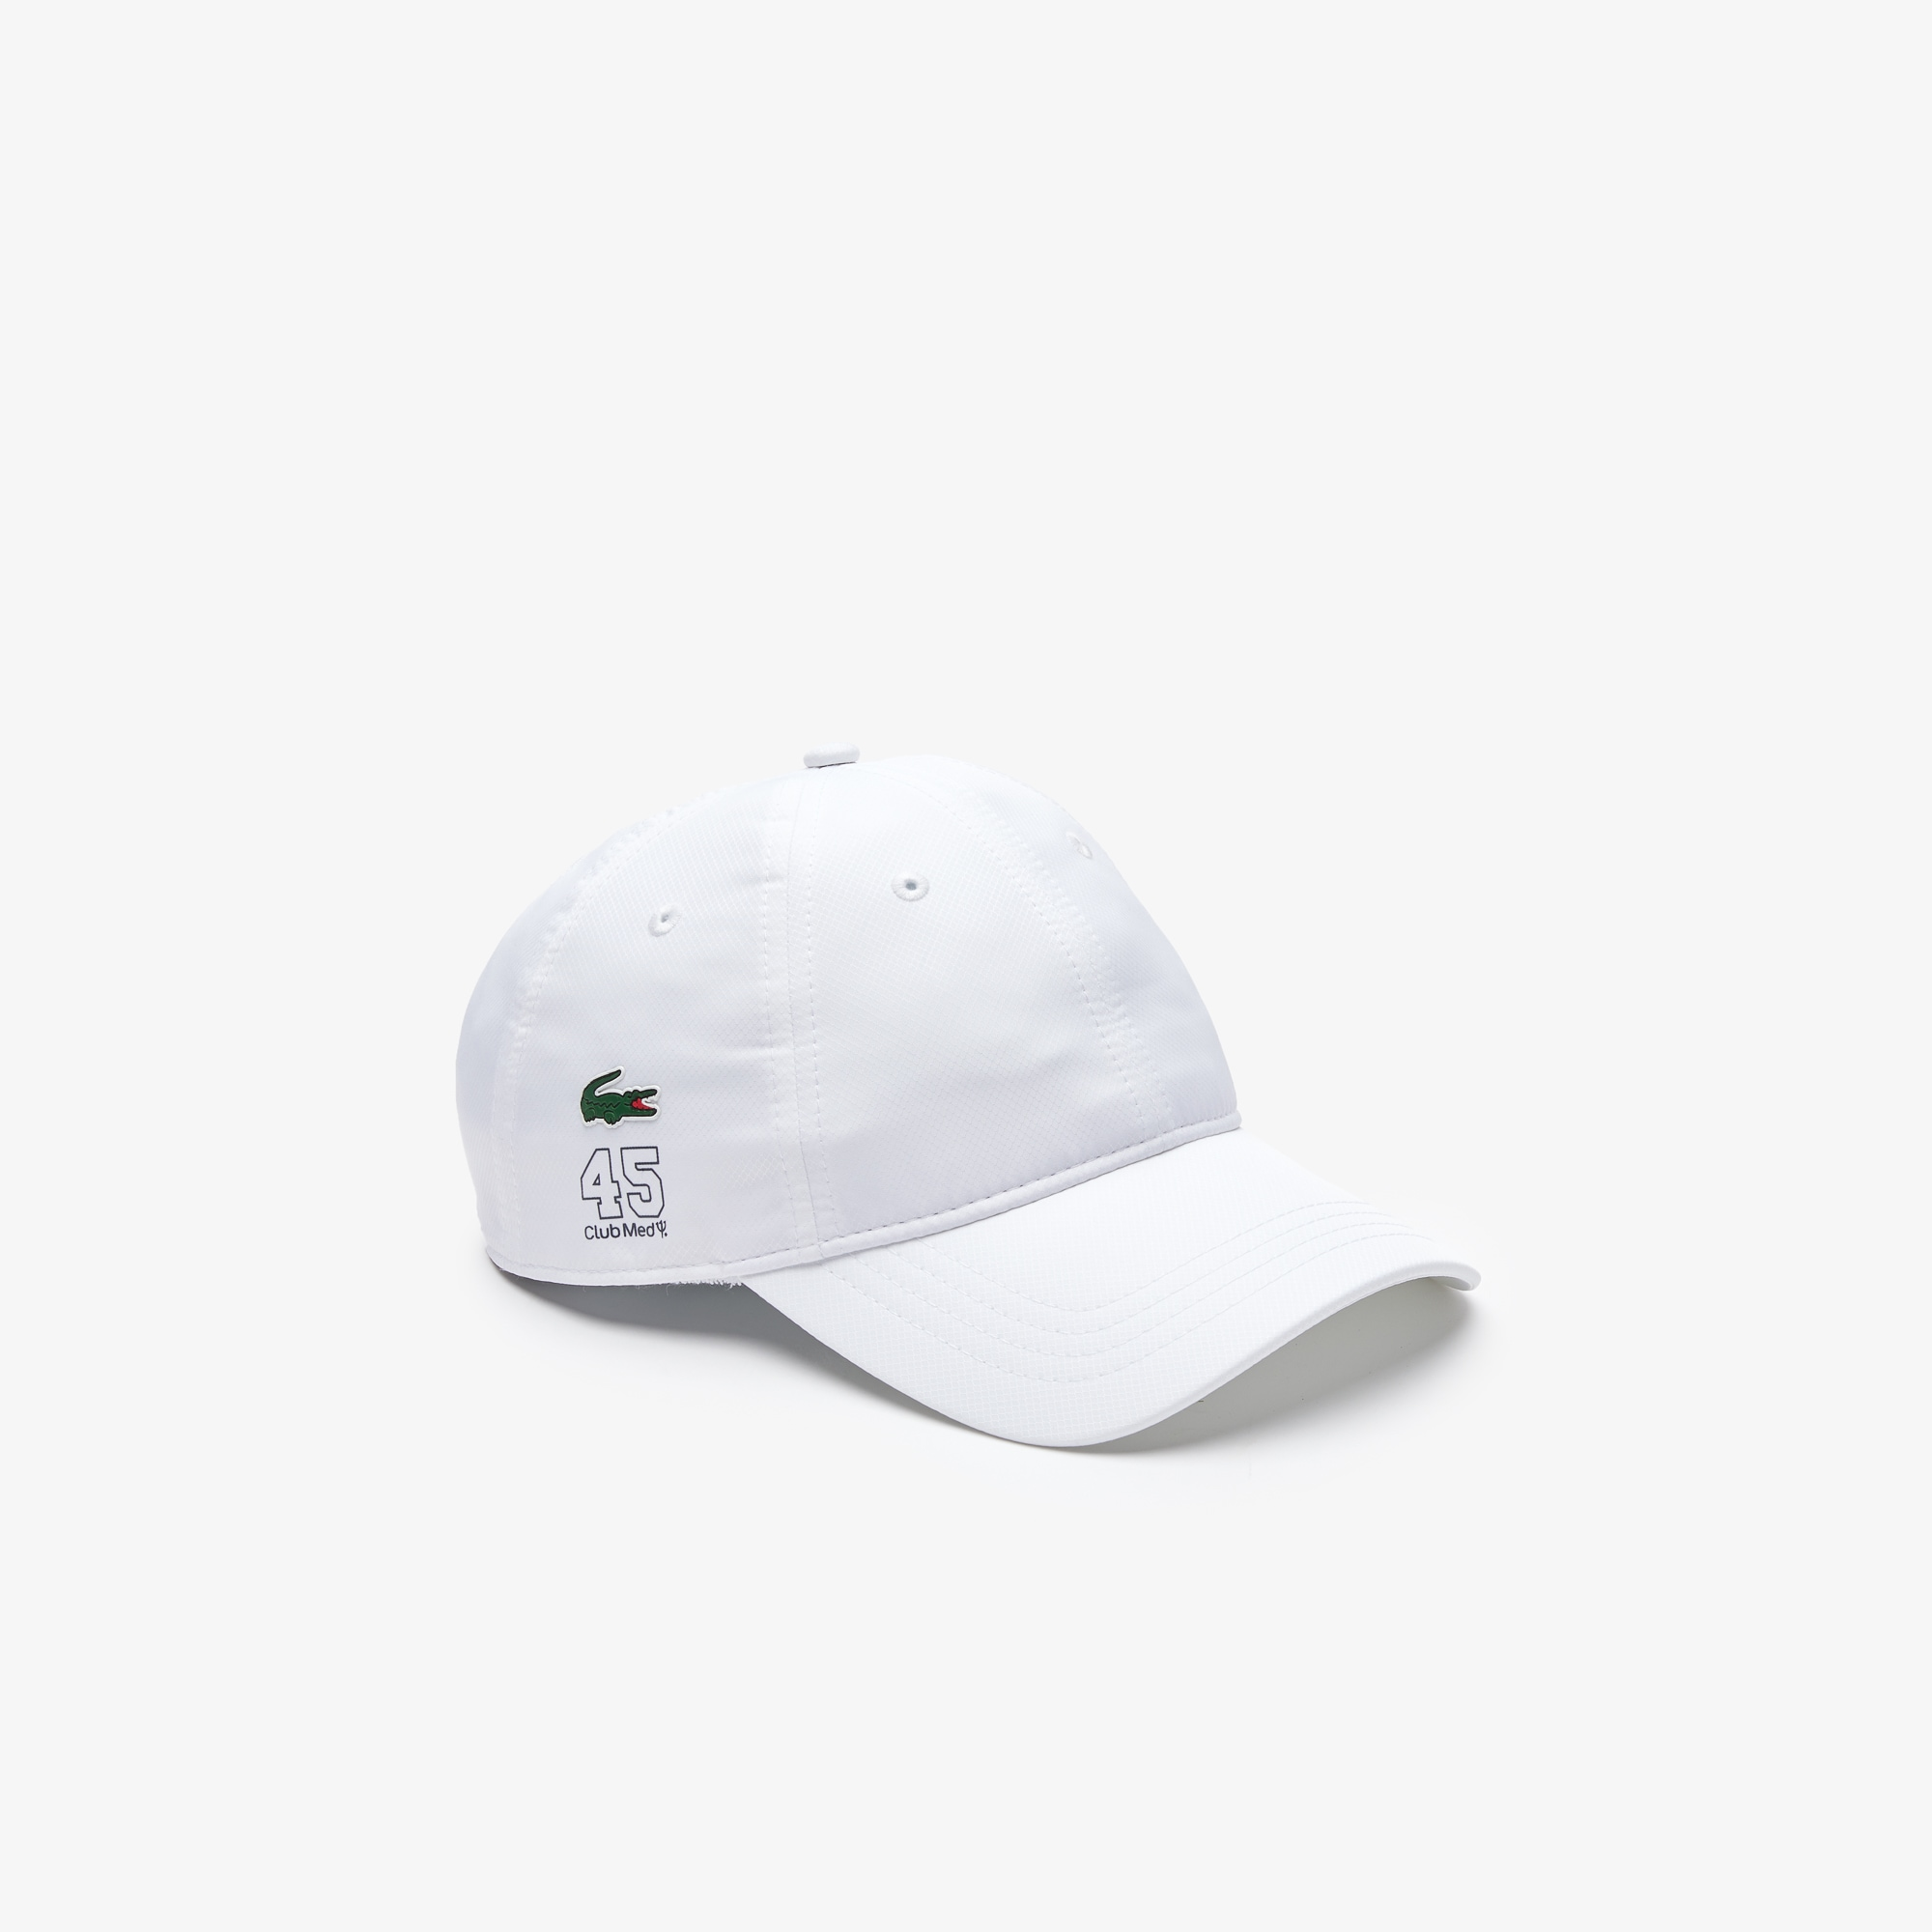 Cappello Uomo Lacoste Club Med